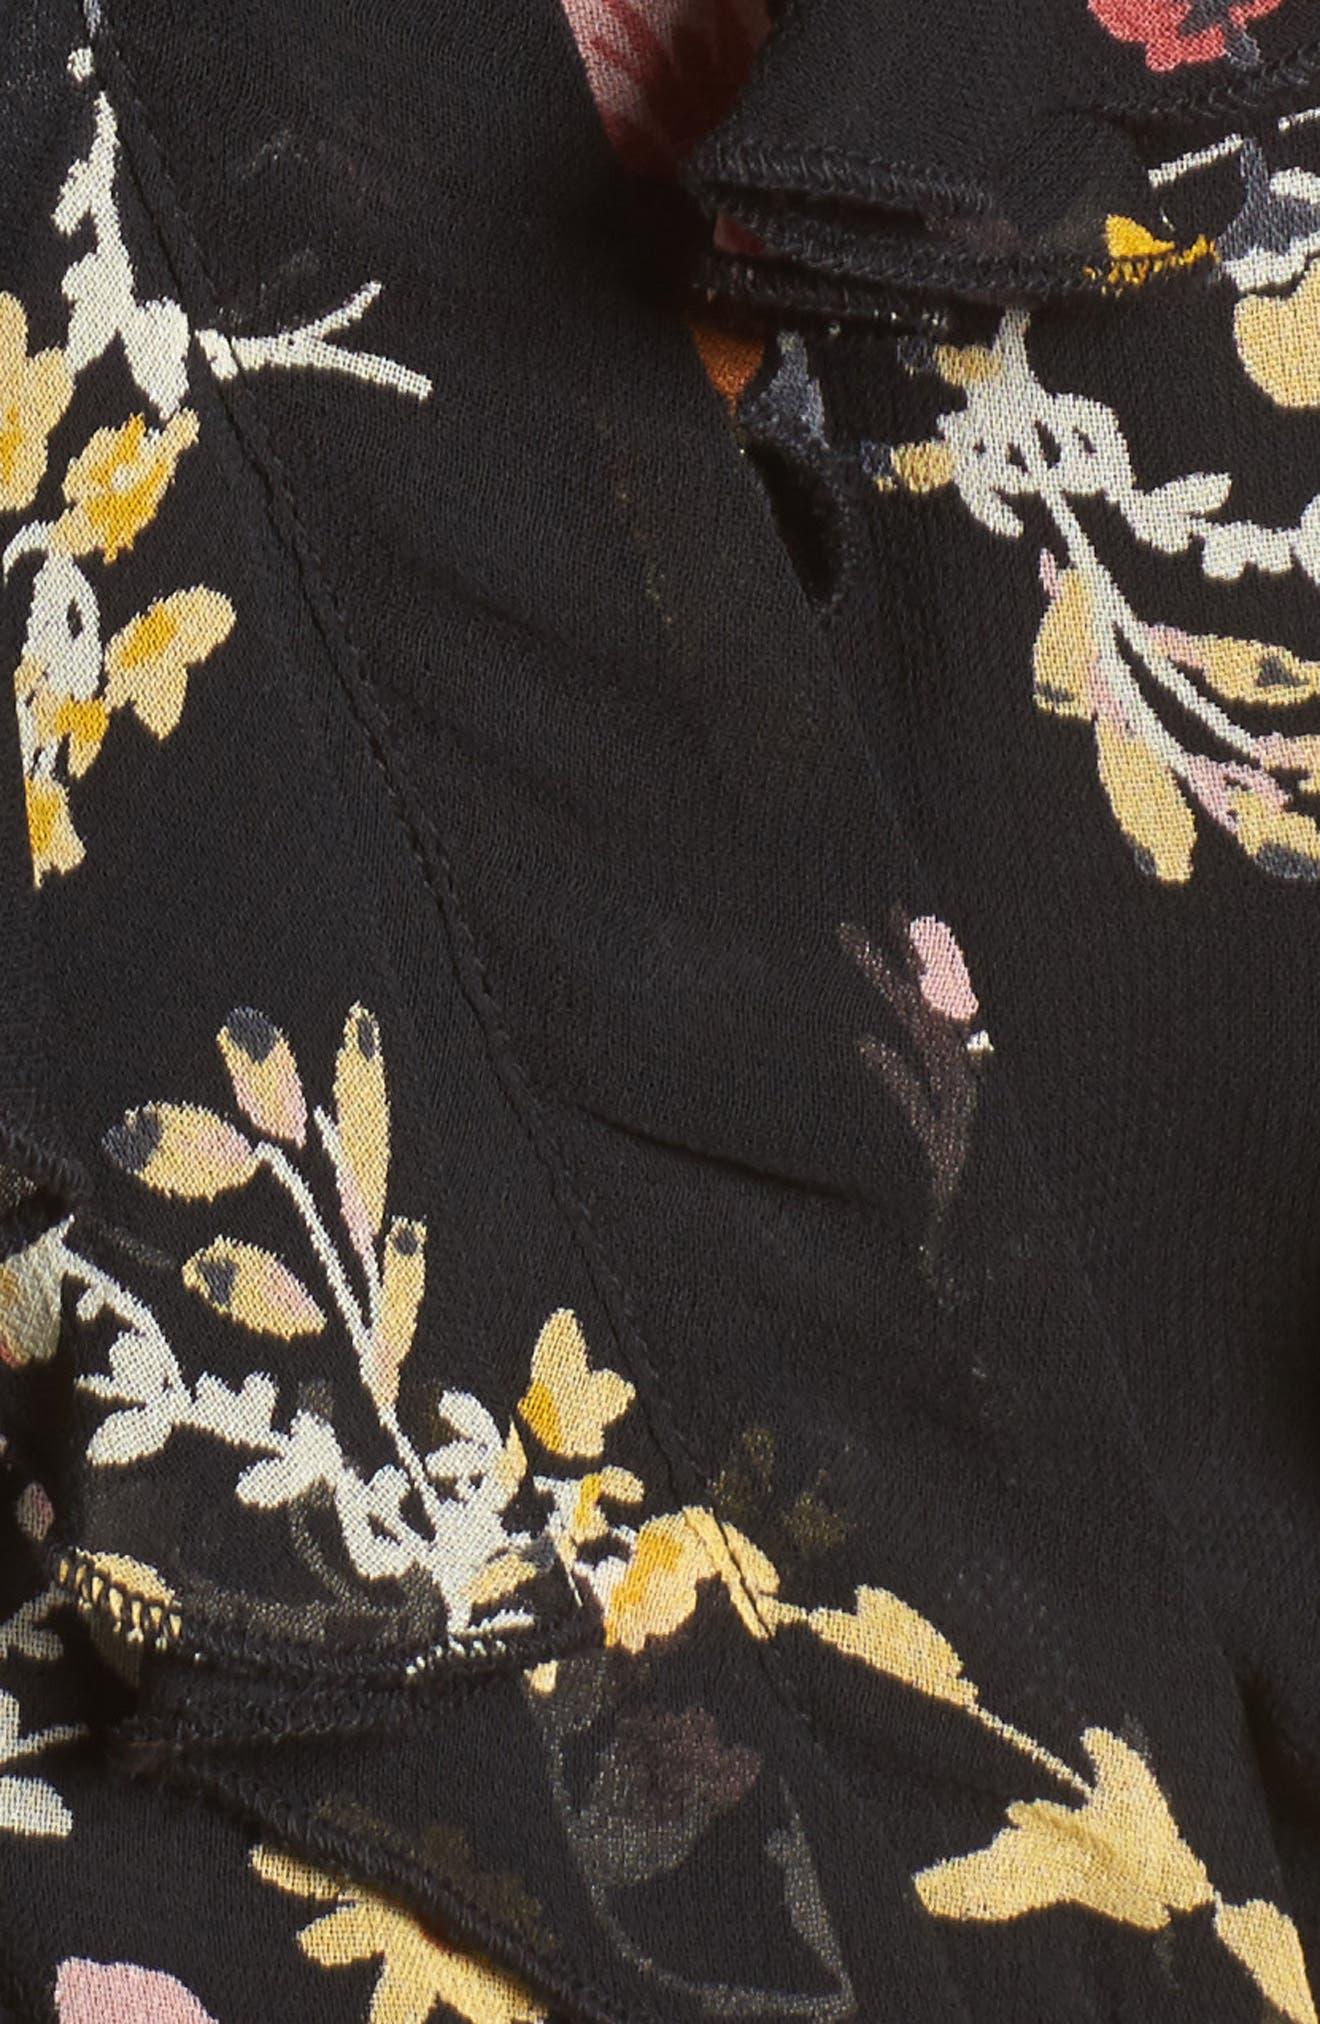 Floral Ruffle Bodysuit,                             Alternate thumbnail 5, color,                             Black/ Mustard